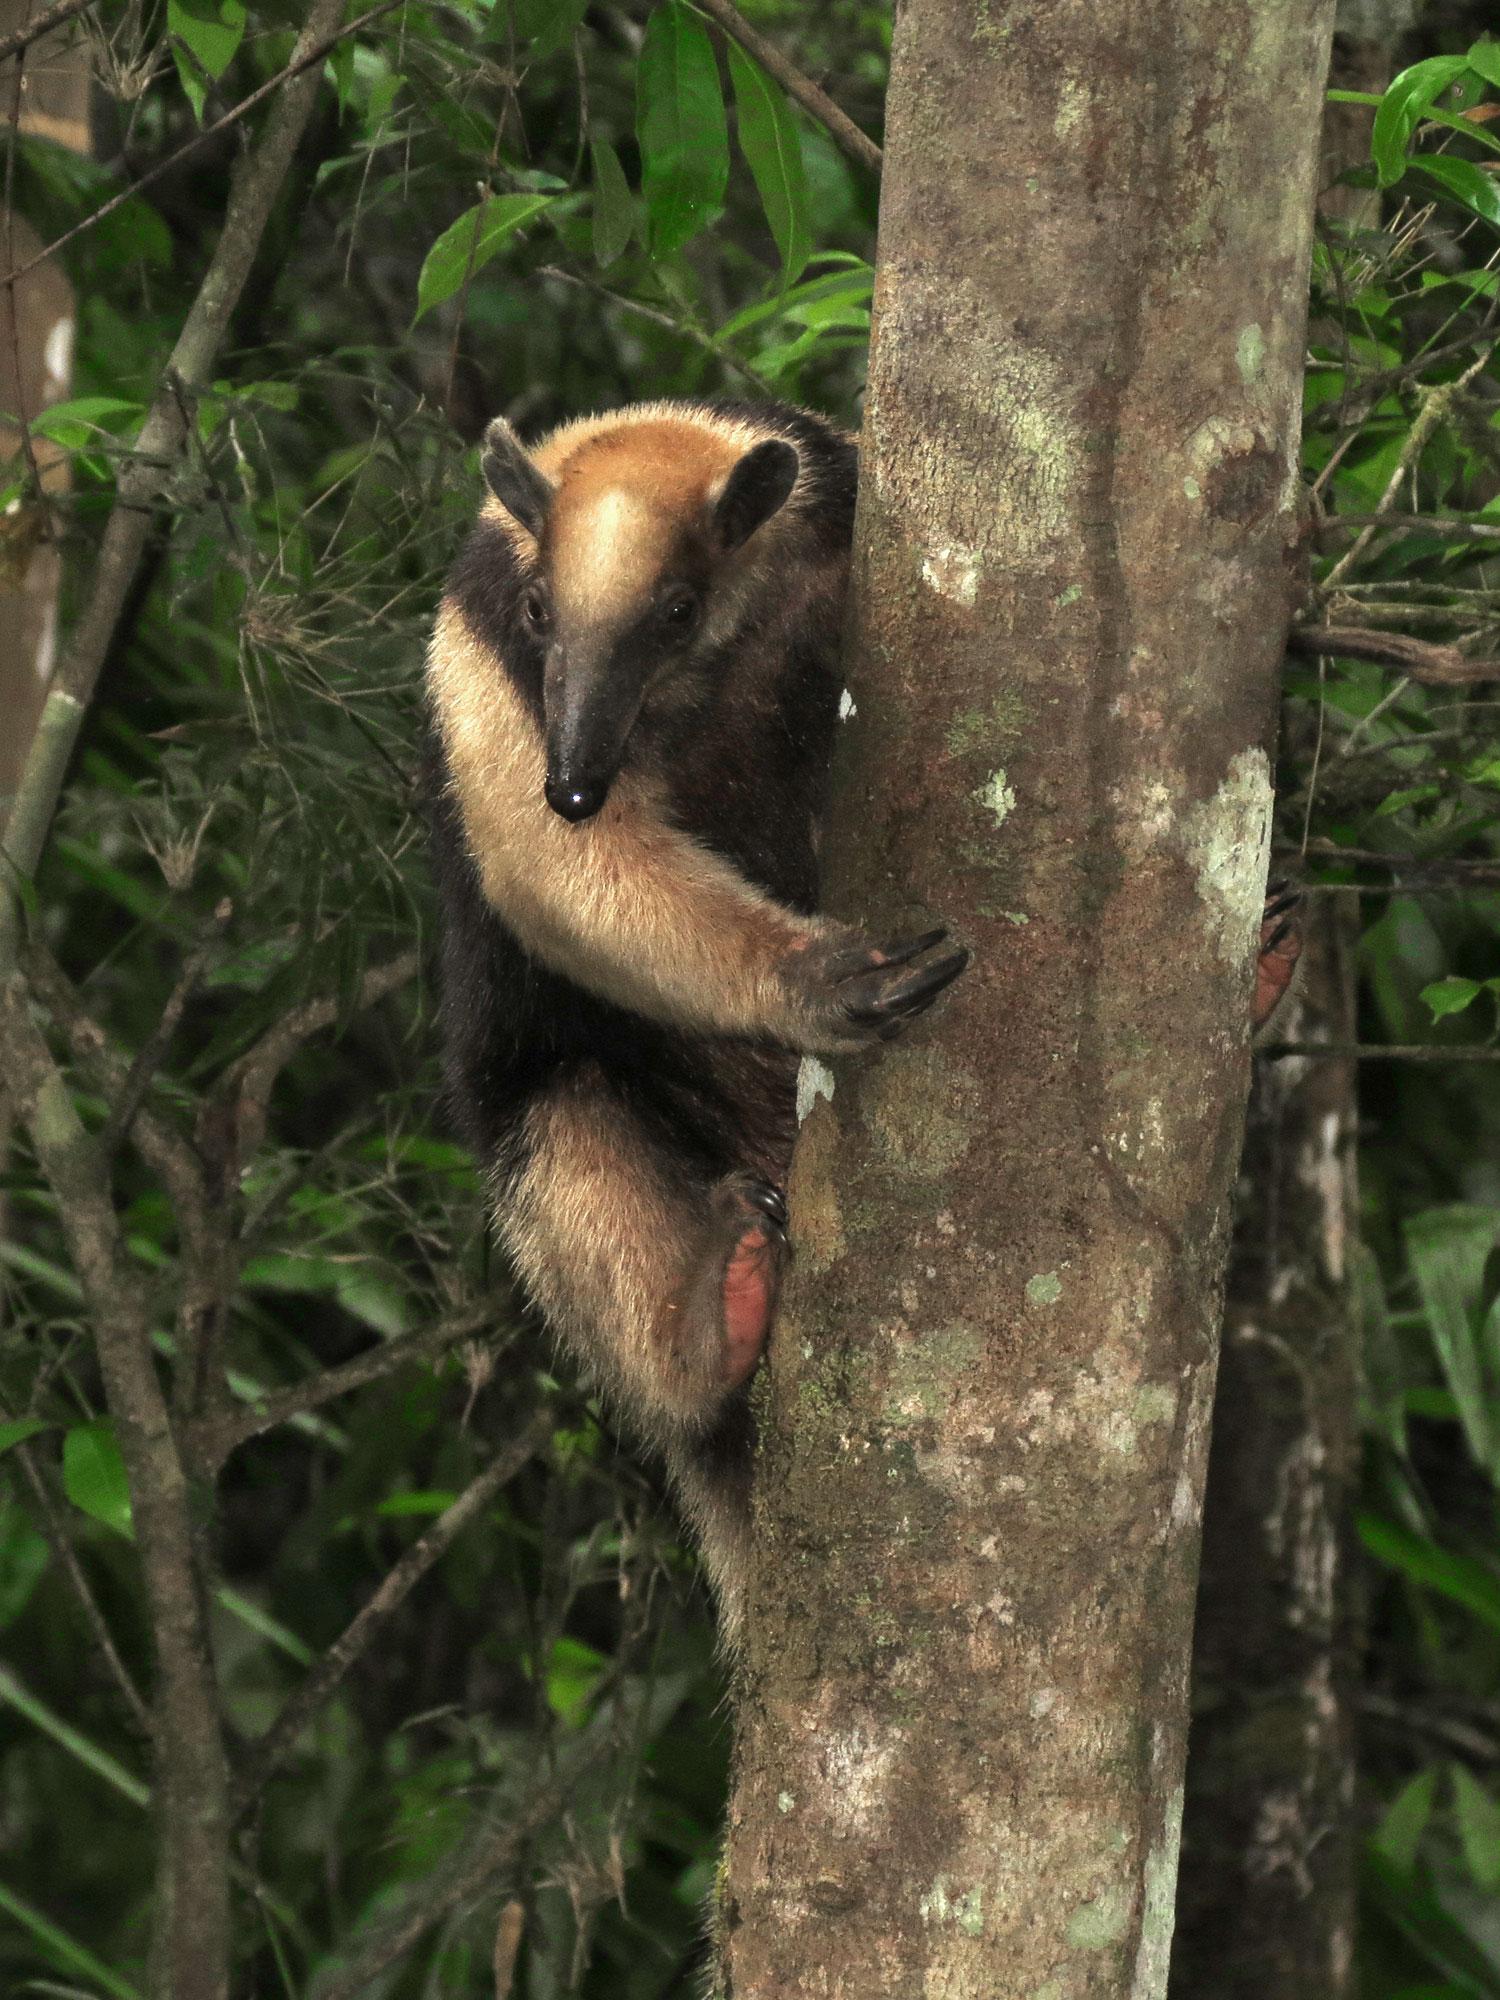 https://upload.wikimedia.org/wikipedia/commons/8/84/Tamandua_cimbing_up_a_tree_-_Flickr_-_treegrow.jpg